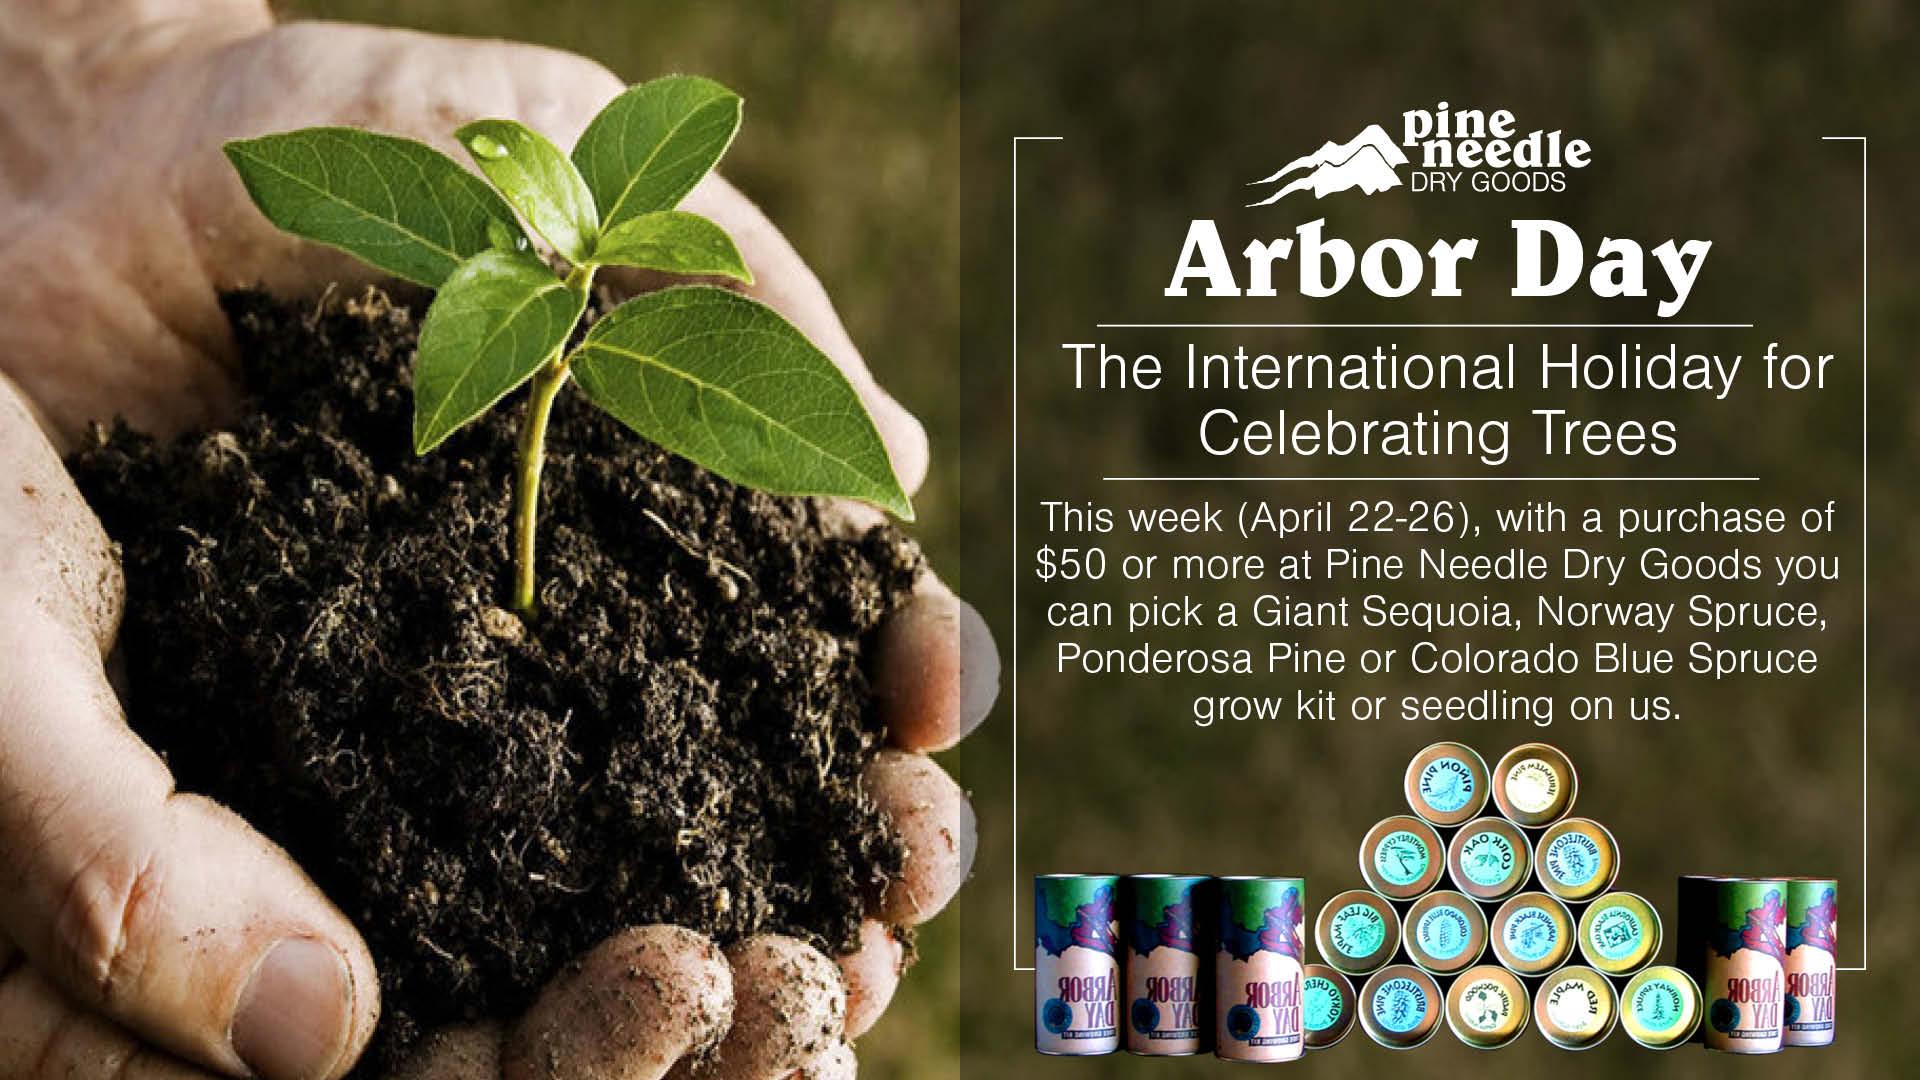 PNDG - Arbor Day Promo 041919.jpg